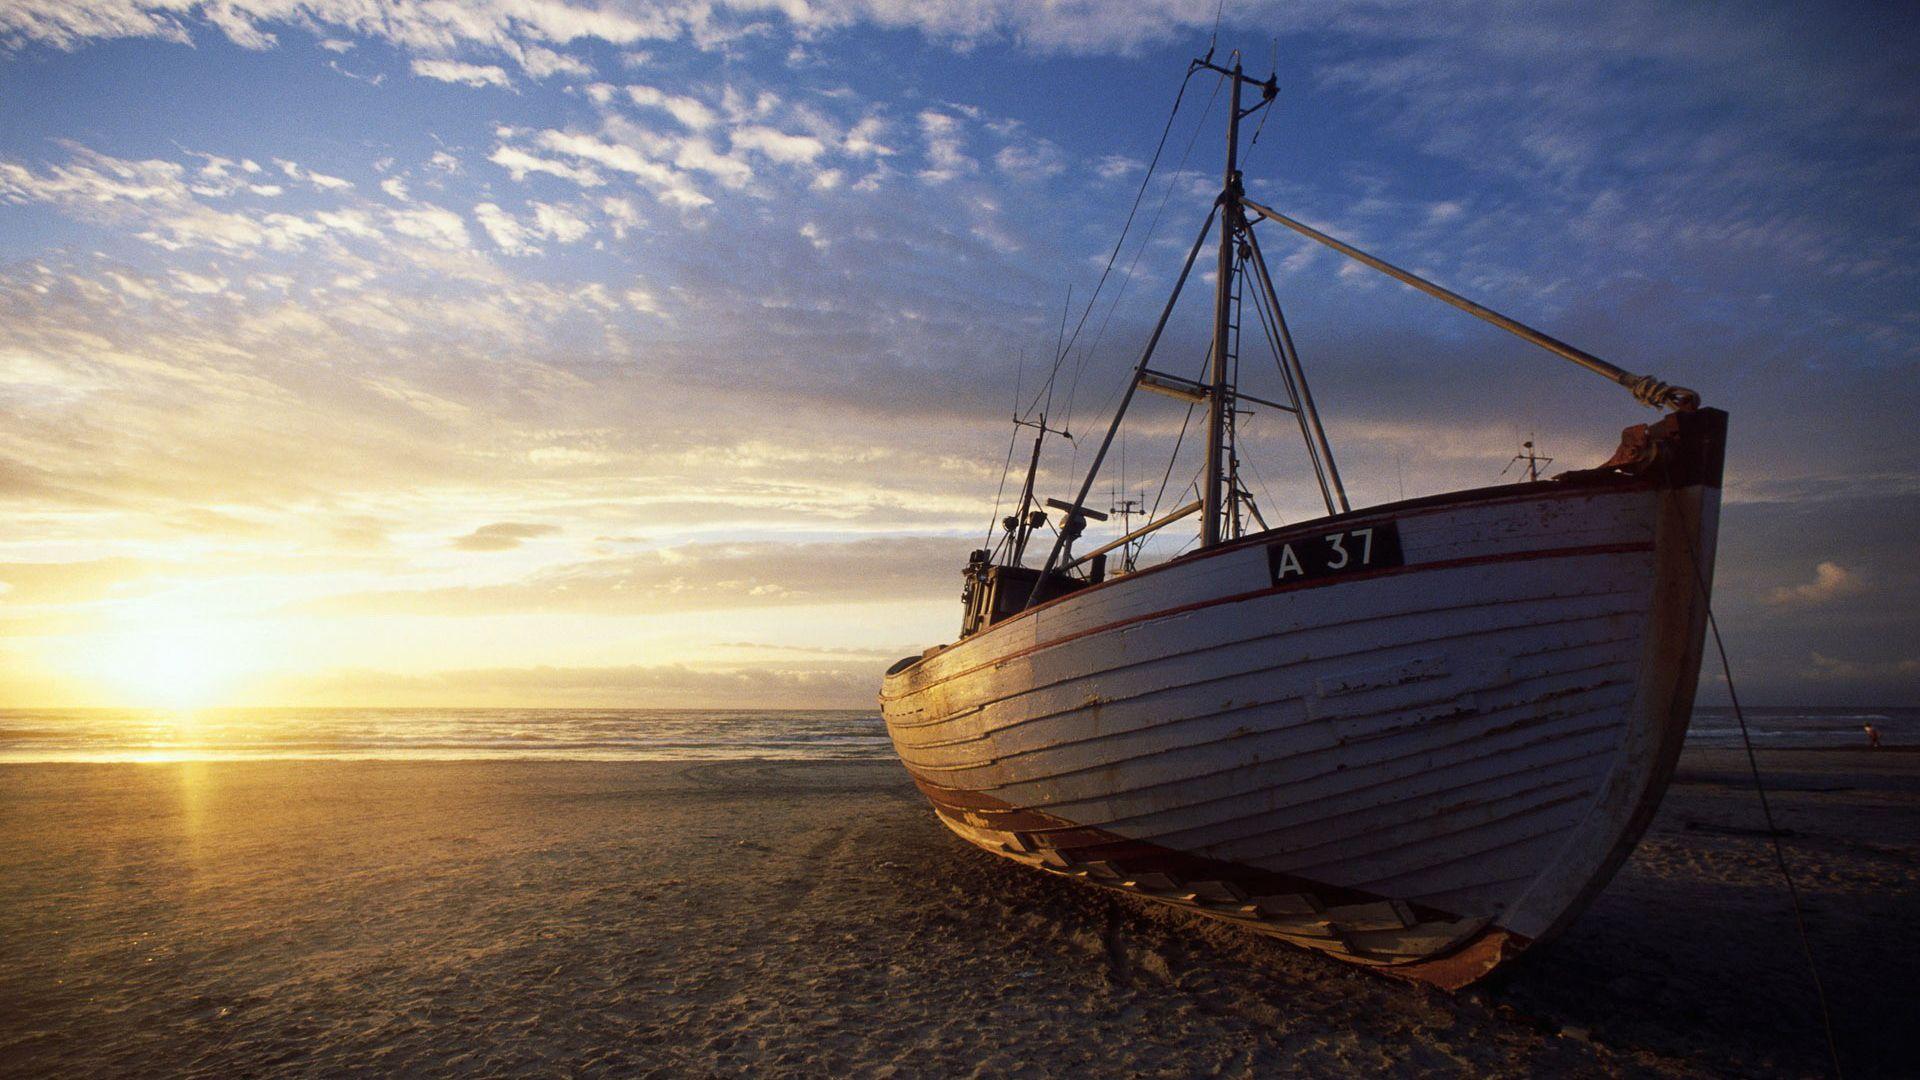 Boat On The Dry Hd Wallpaper Boat Wallpaper Boat Fishing Boats